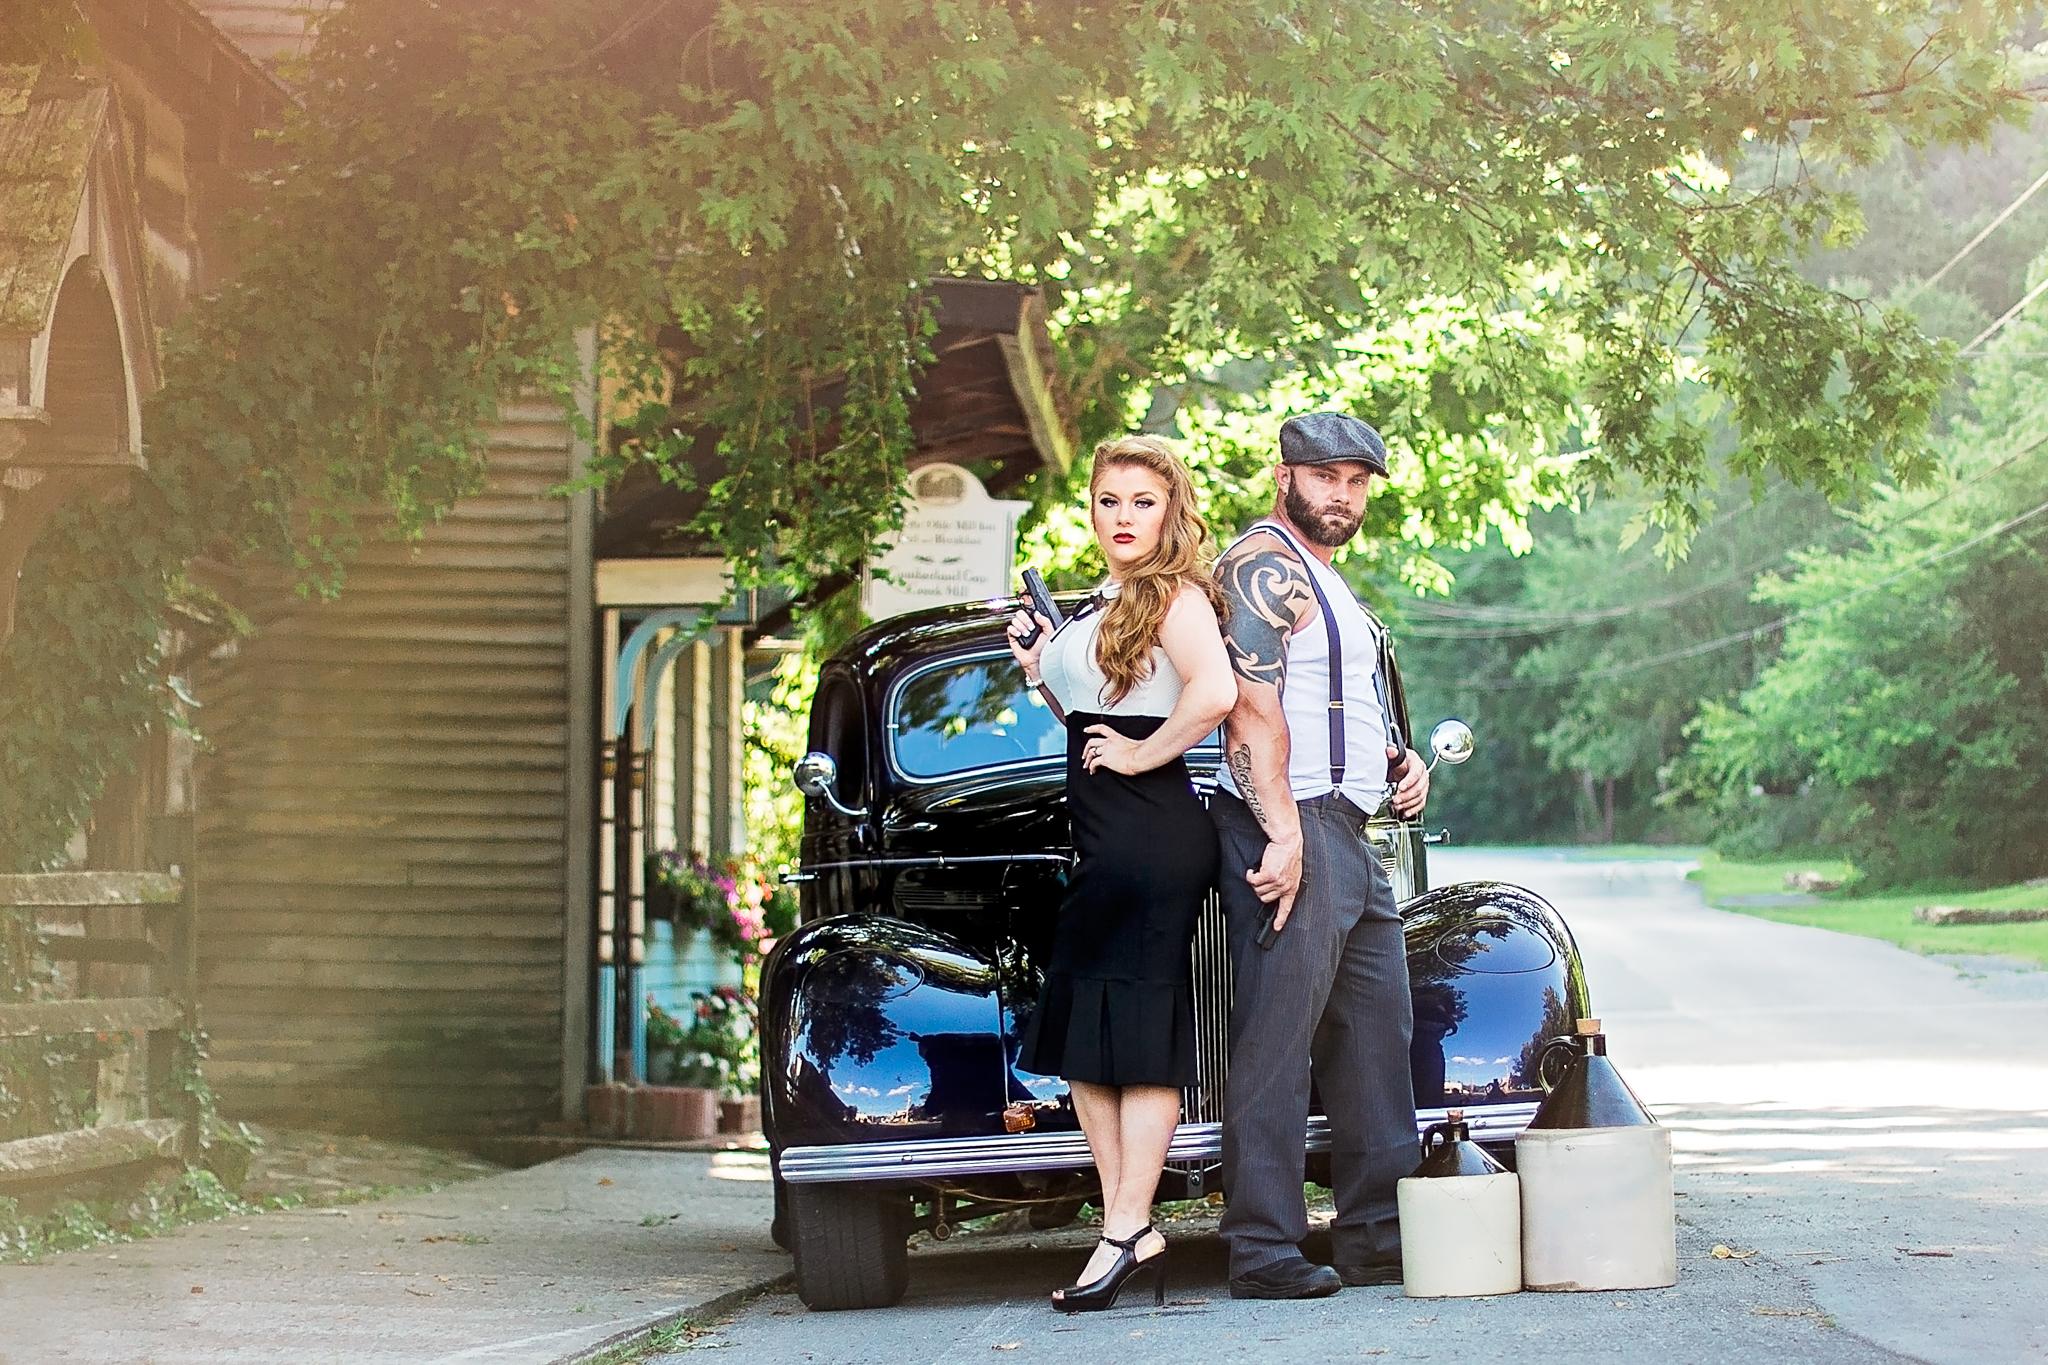 Richmond Kentucky Engagement Photographer - Ariana Jordan Photography -4.jpg